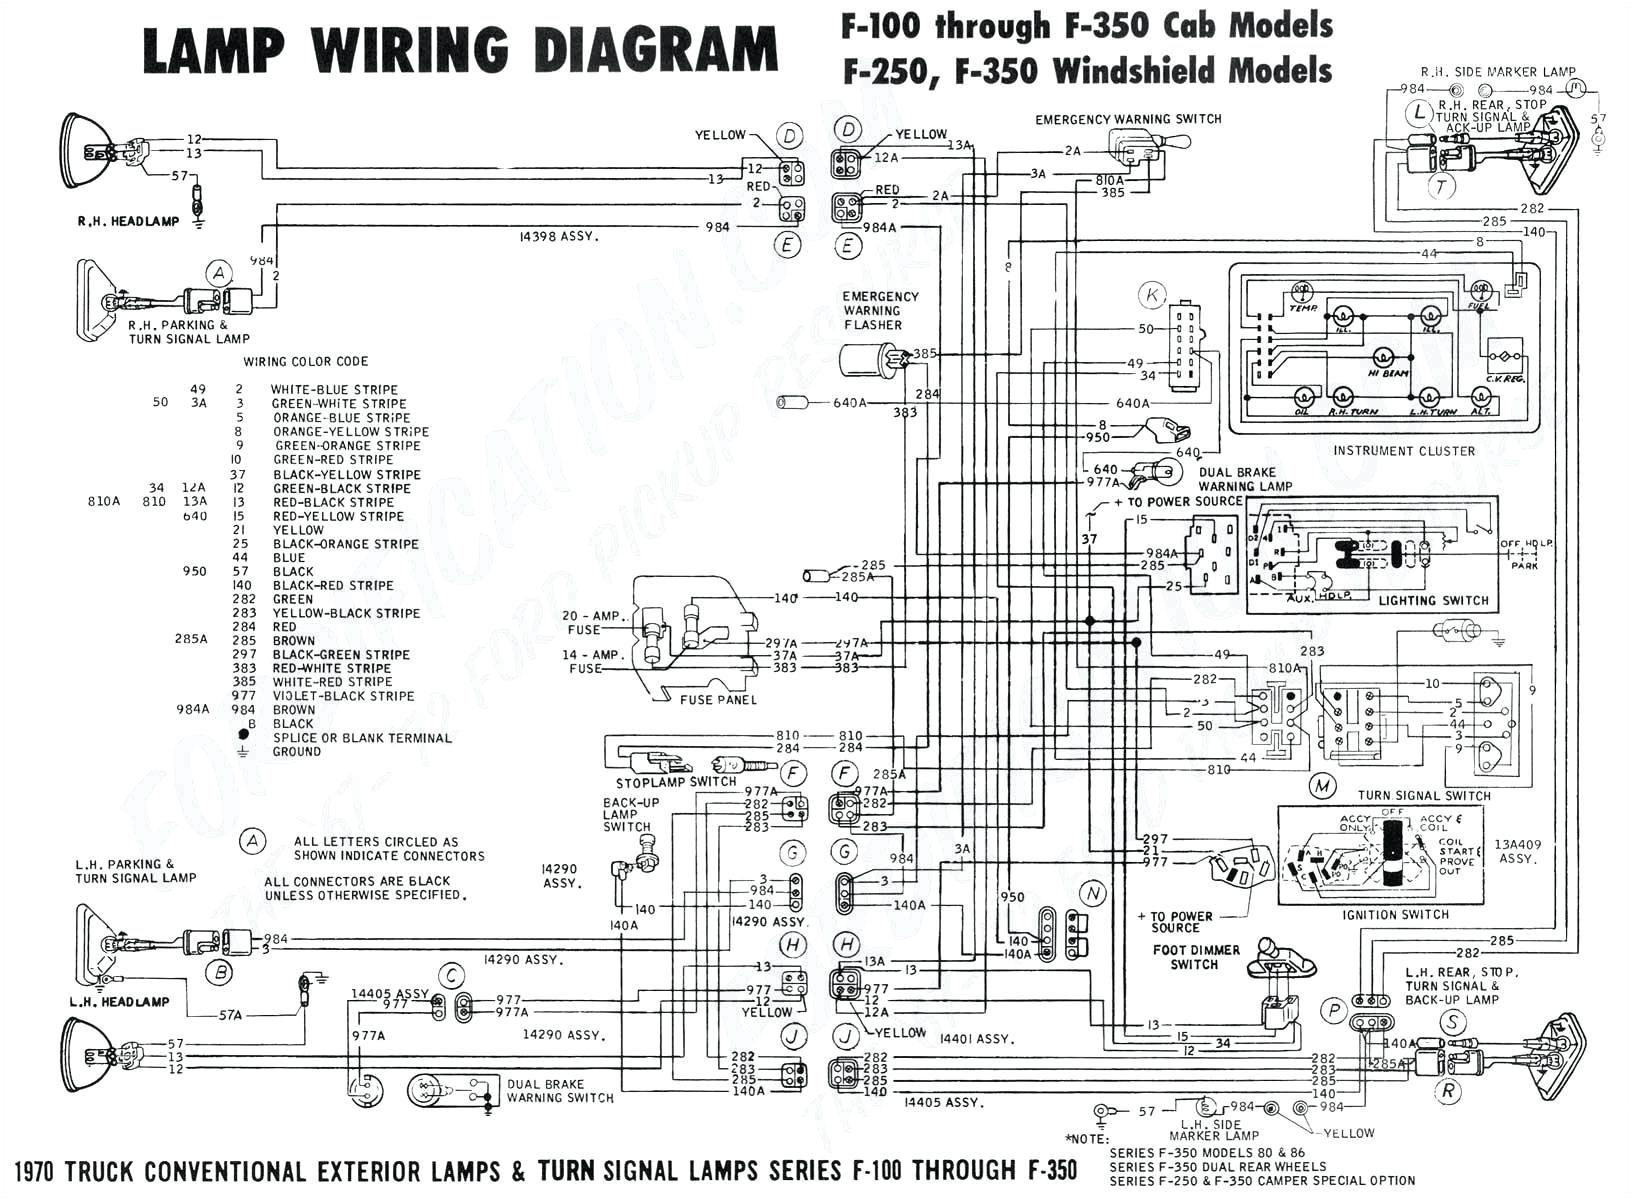 co sensor wiring diagram wiring diagram for you co sensor wiring diagram